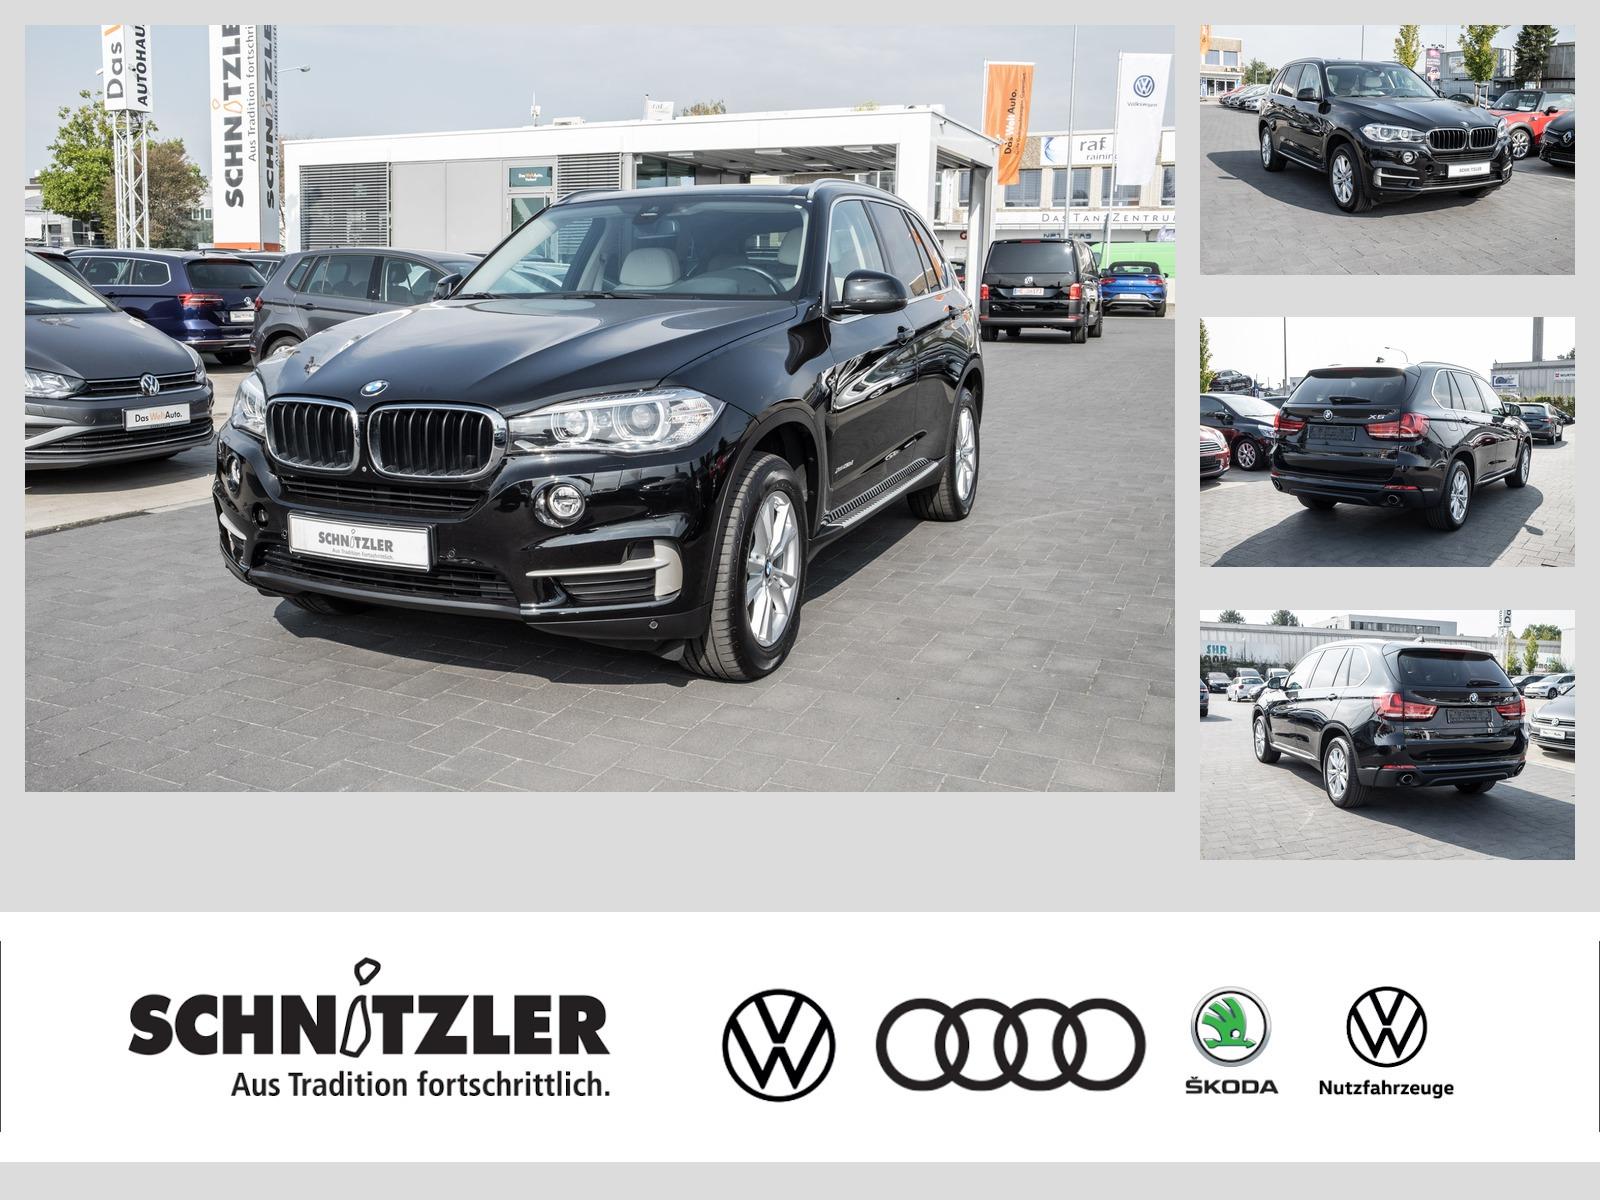 BMW X5 xDrive30d PANO/NAVI/LEDER/KAMERA+++, Jahr 2014, Diesel